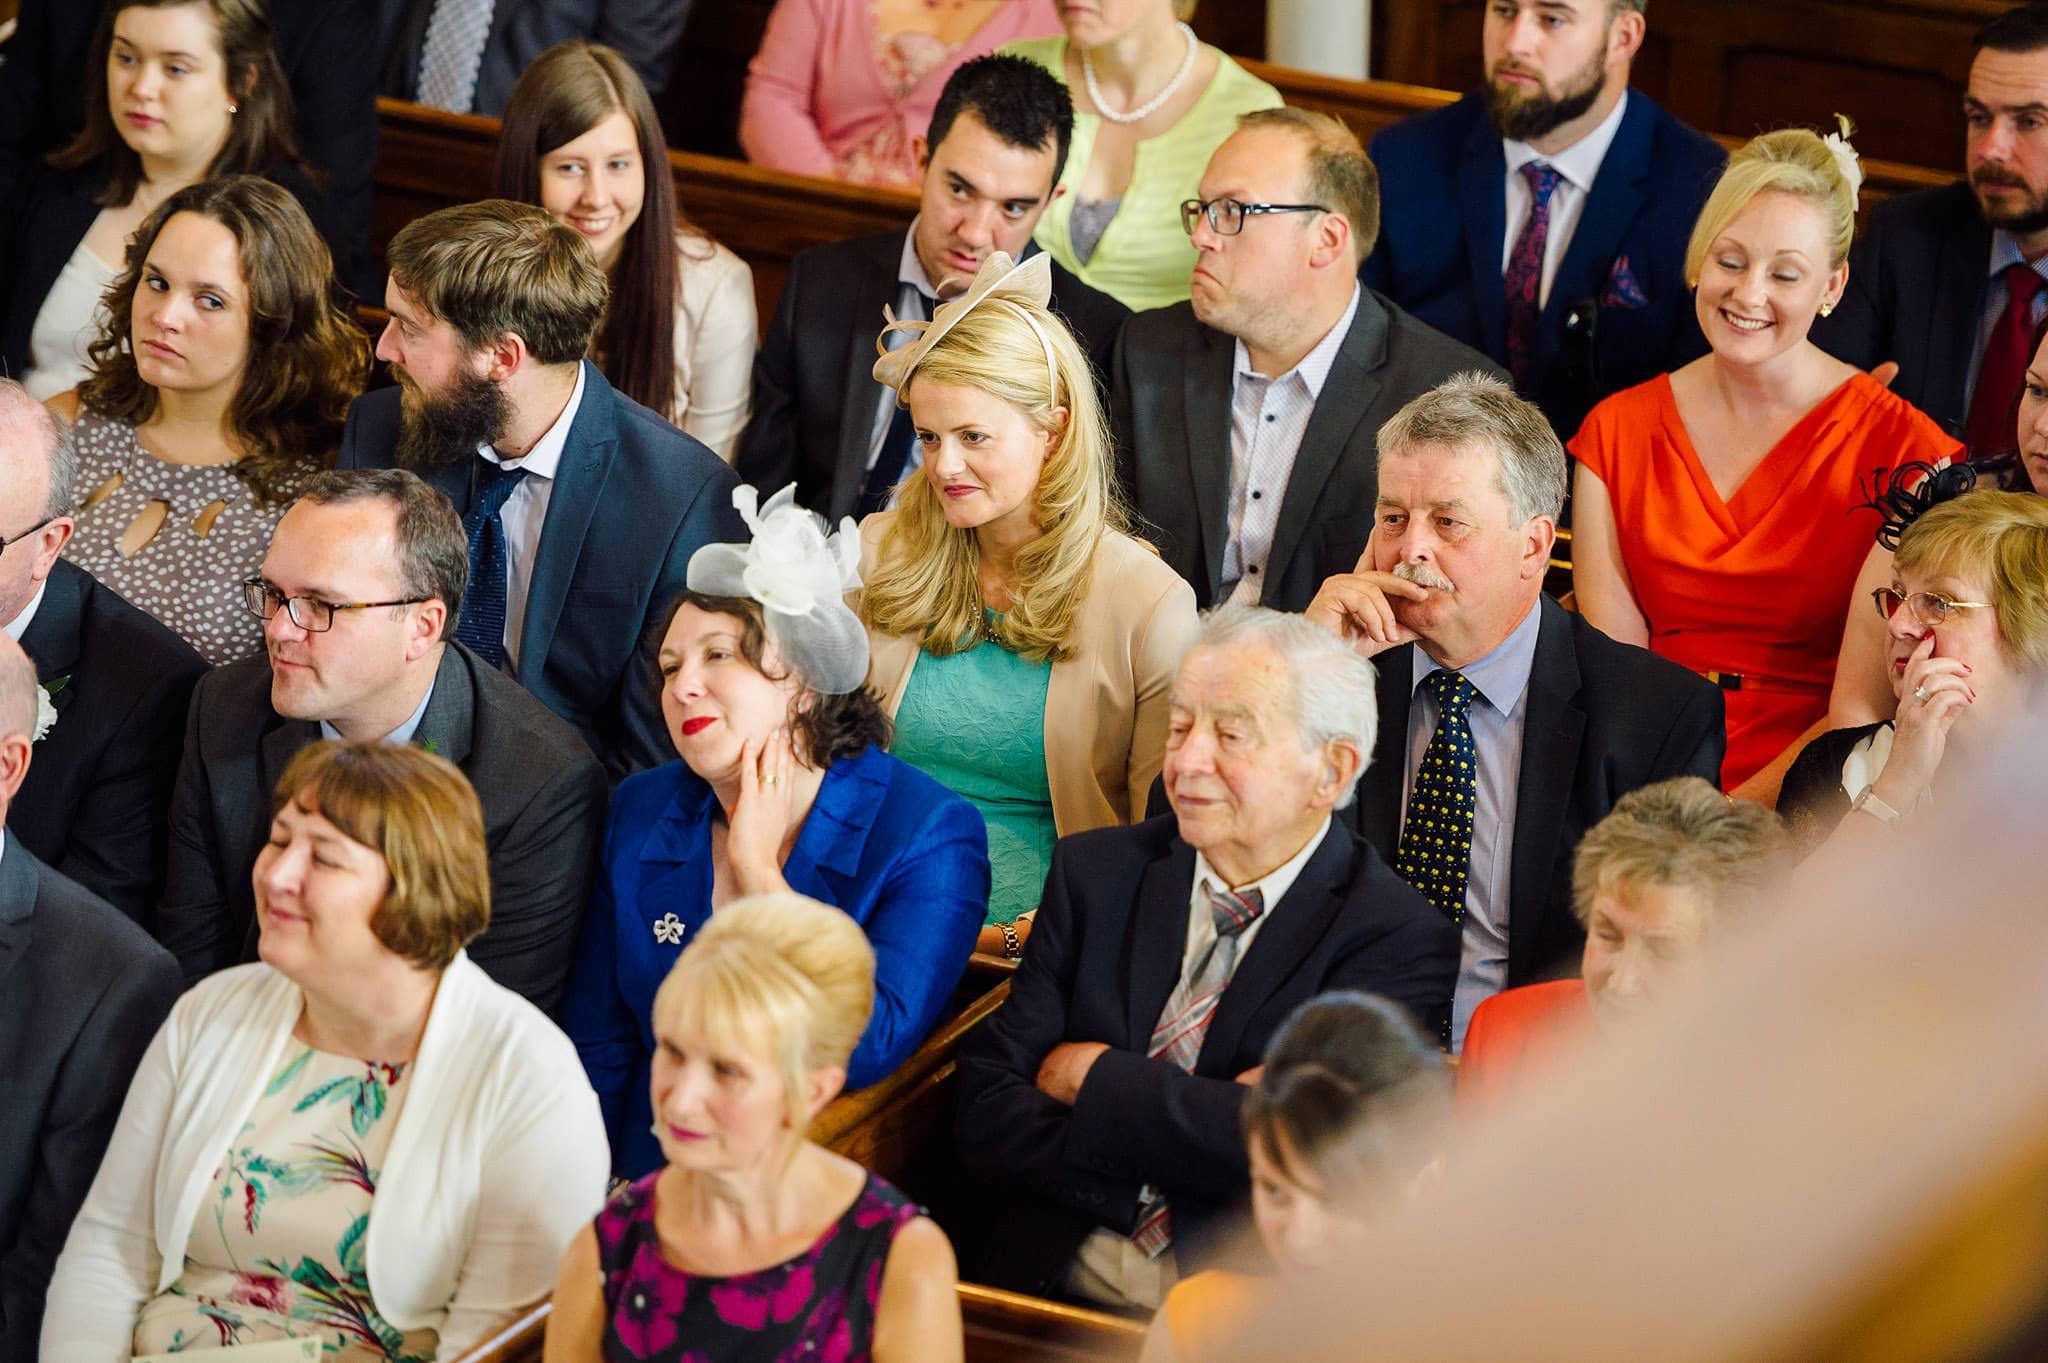 wedding-photographer-aberystwyth-wales (47)